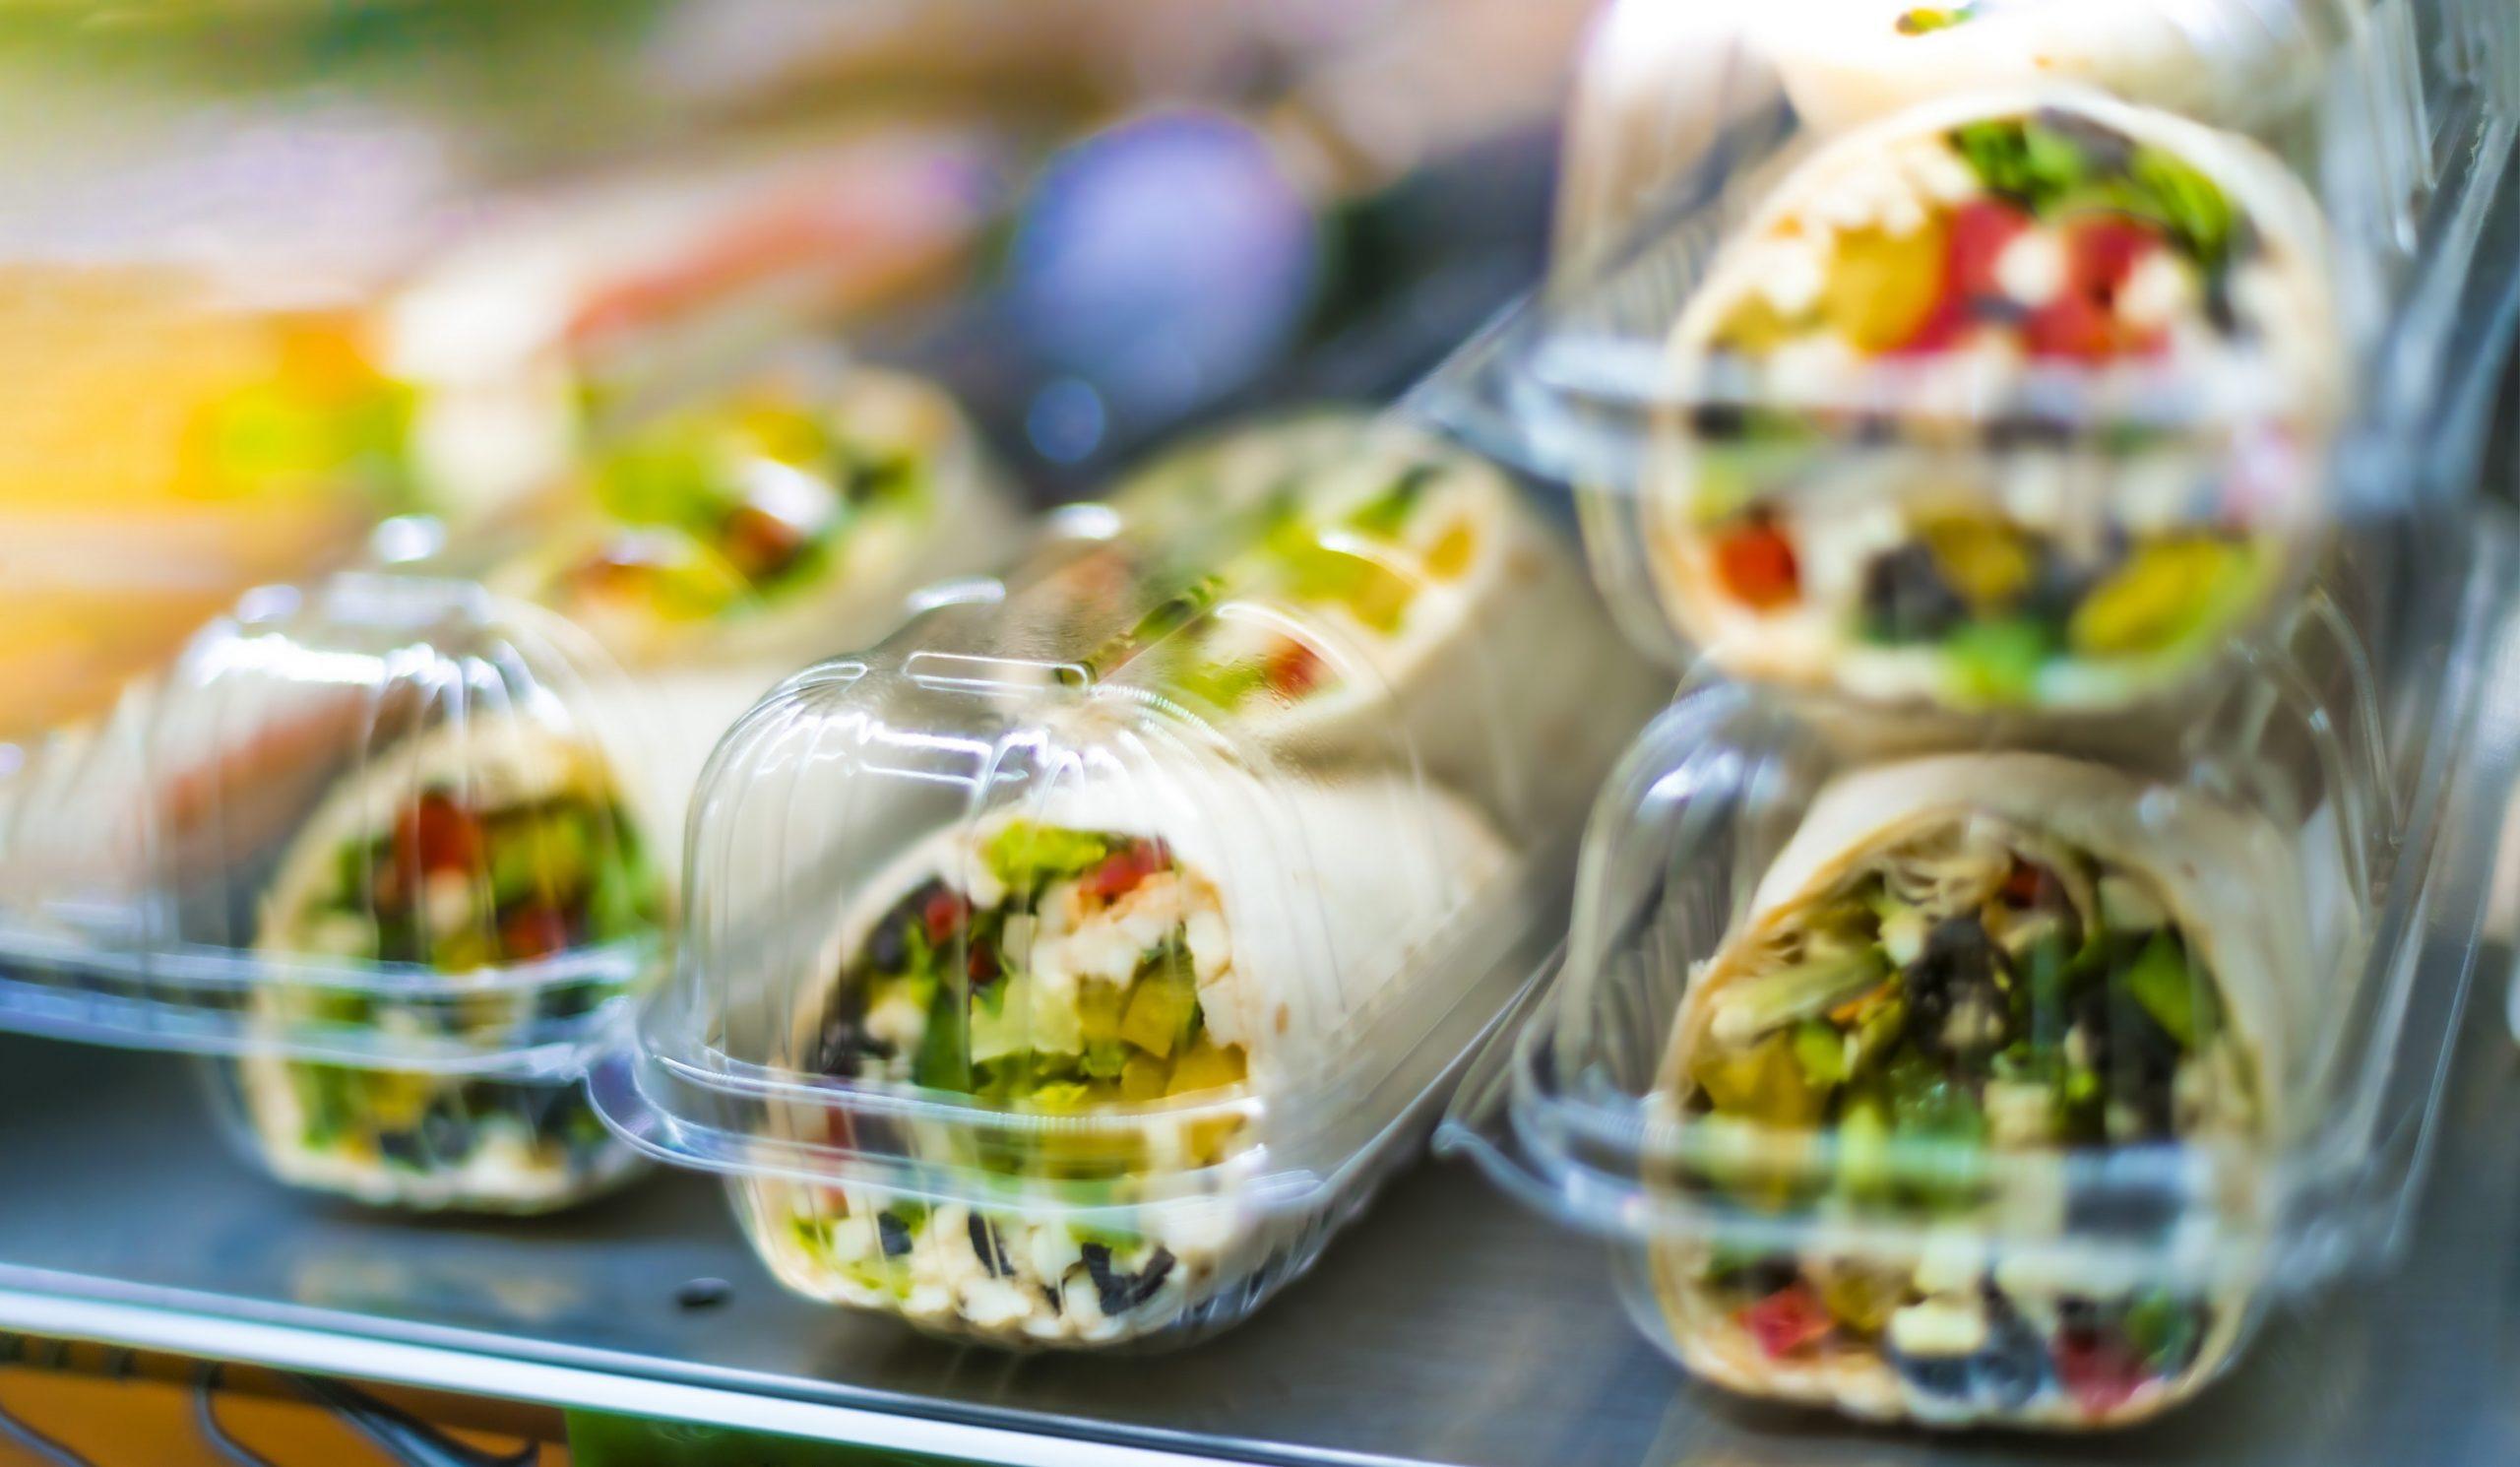 Augusta Micro-Market | Break Room | Healthy Products | Open Market